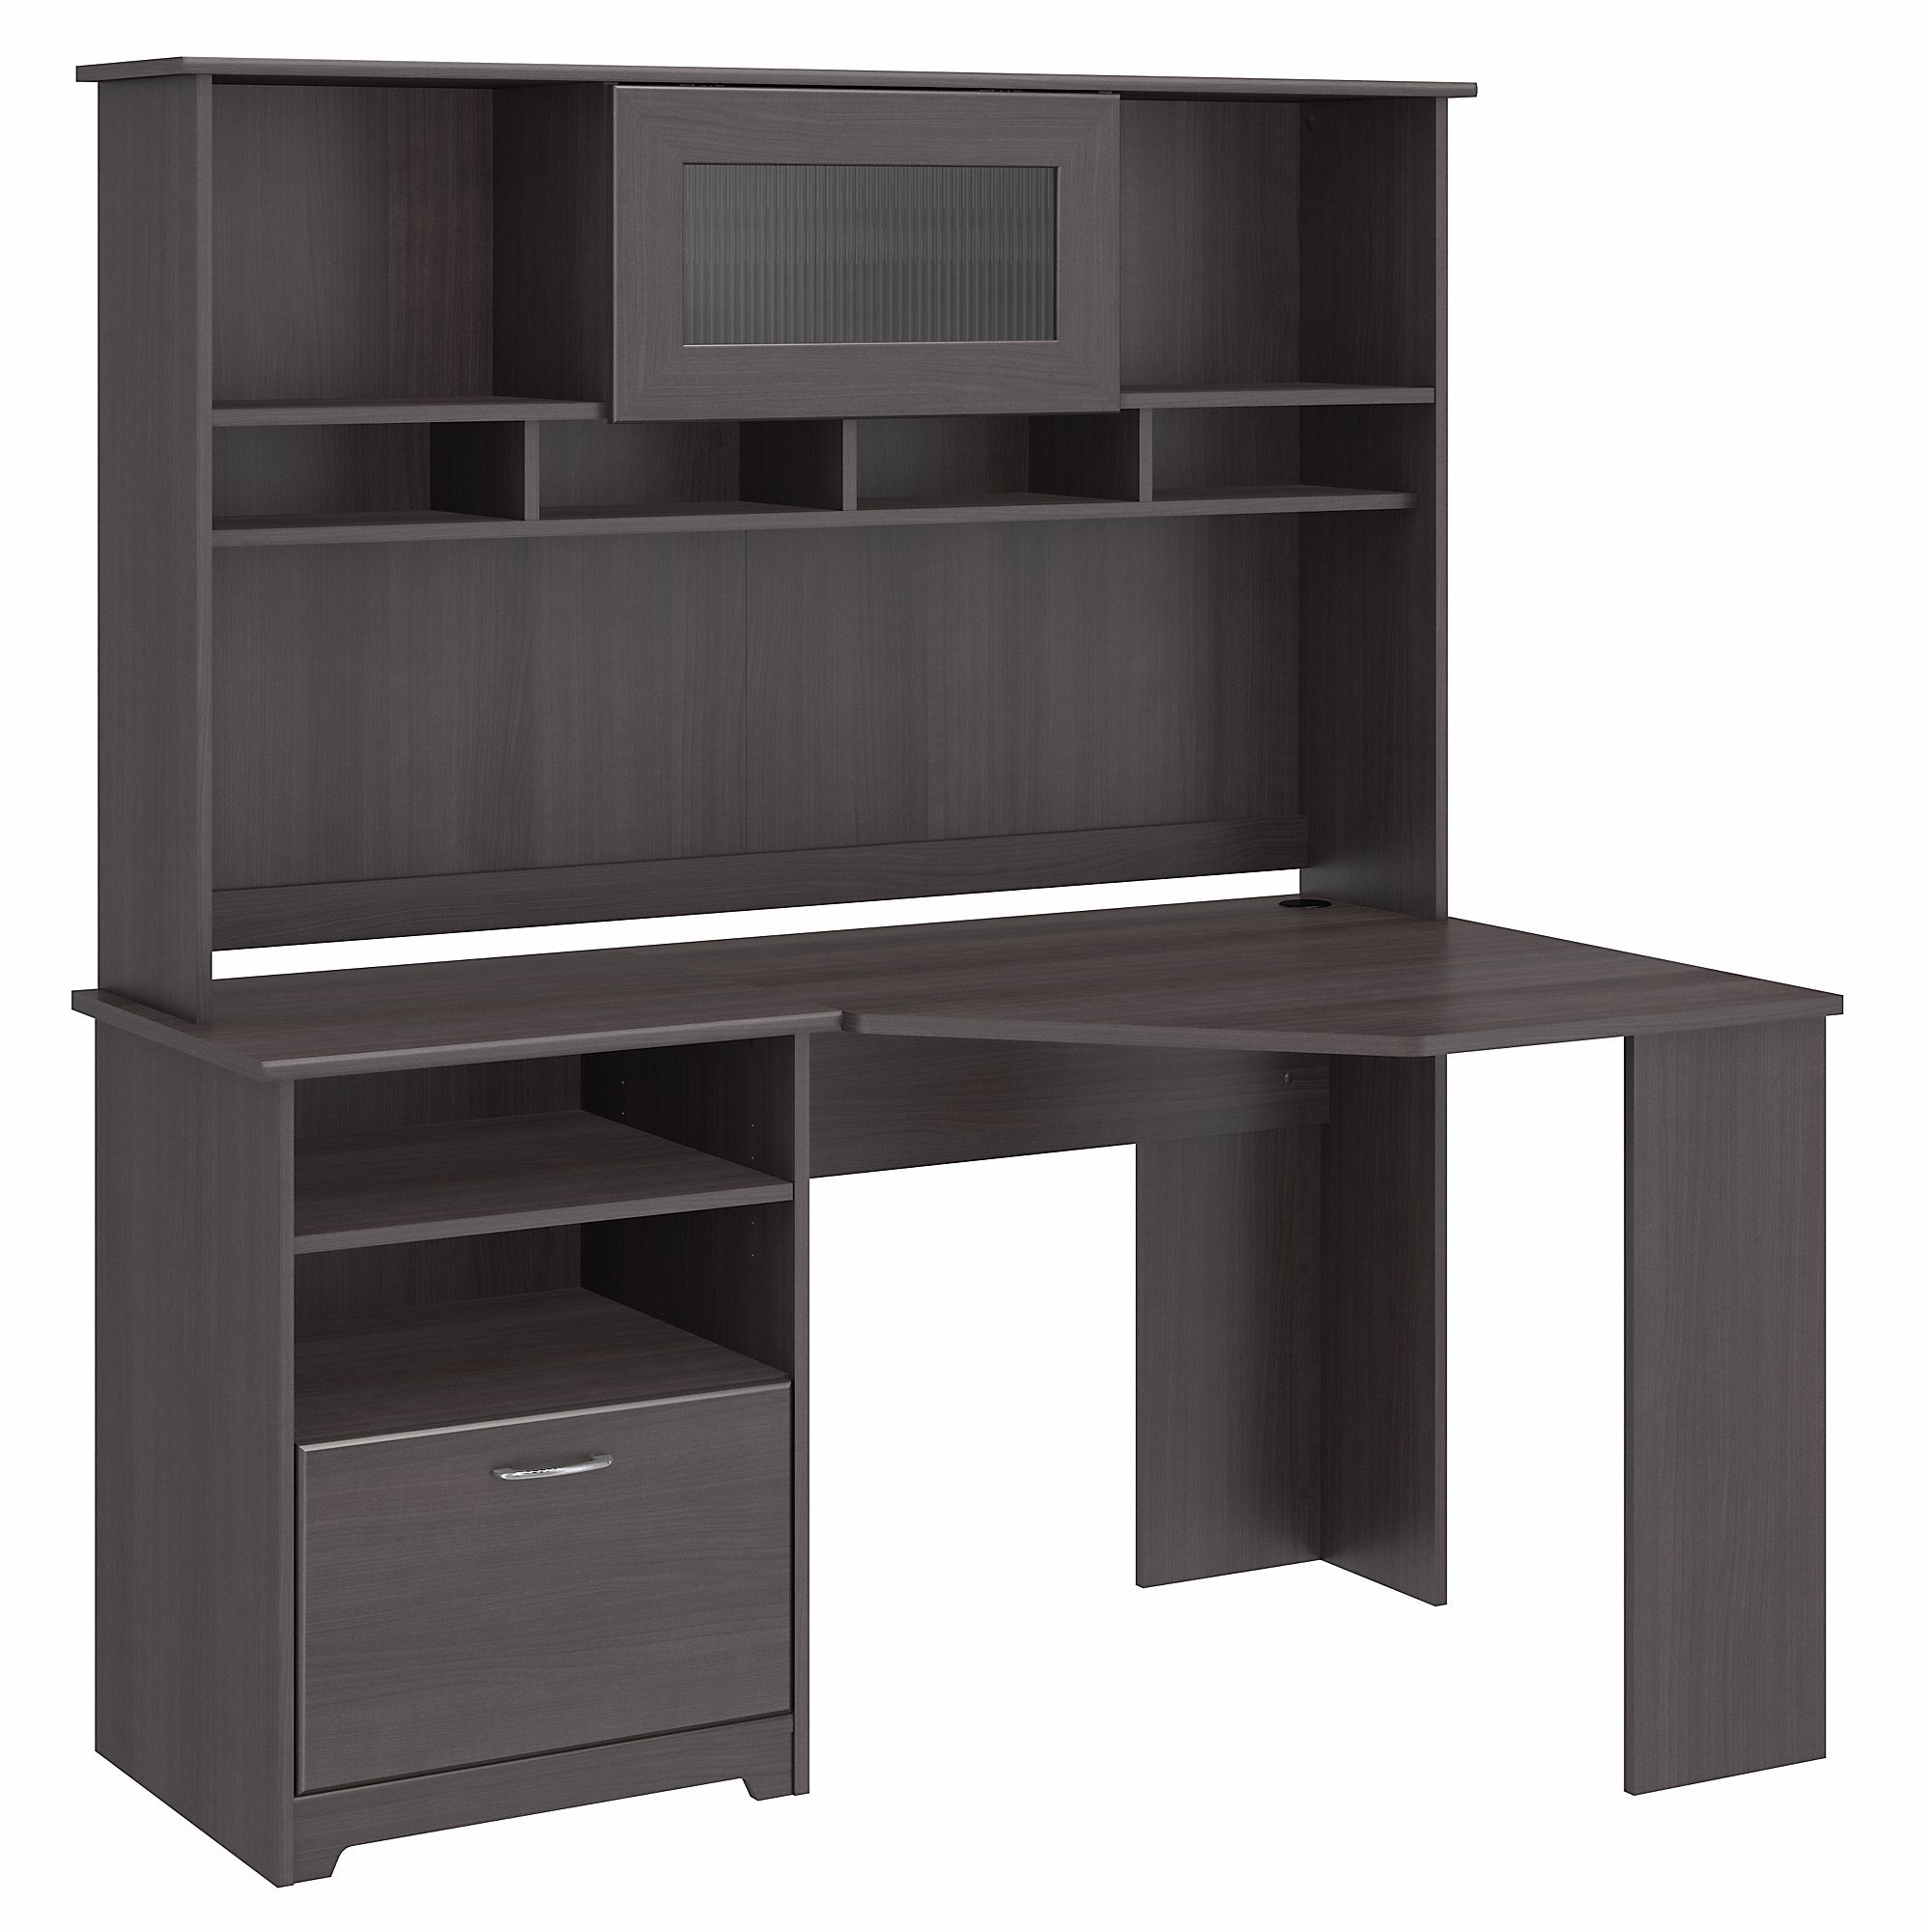 Bush Furniture Cabot Corner Desk with Hutch in Heather Gray by Bush Furniture